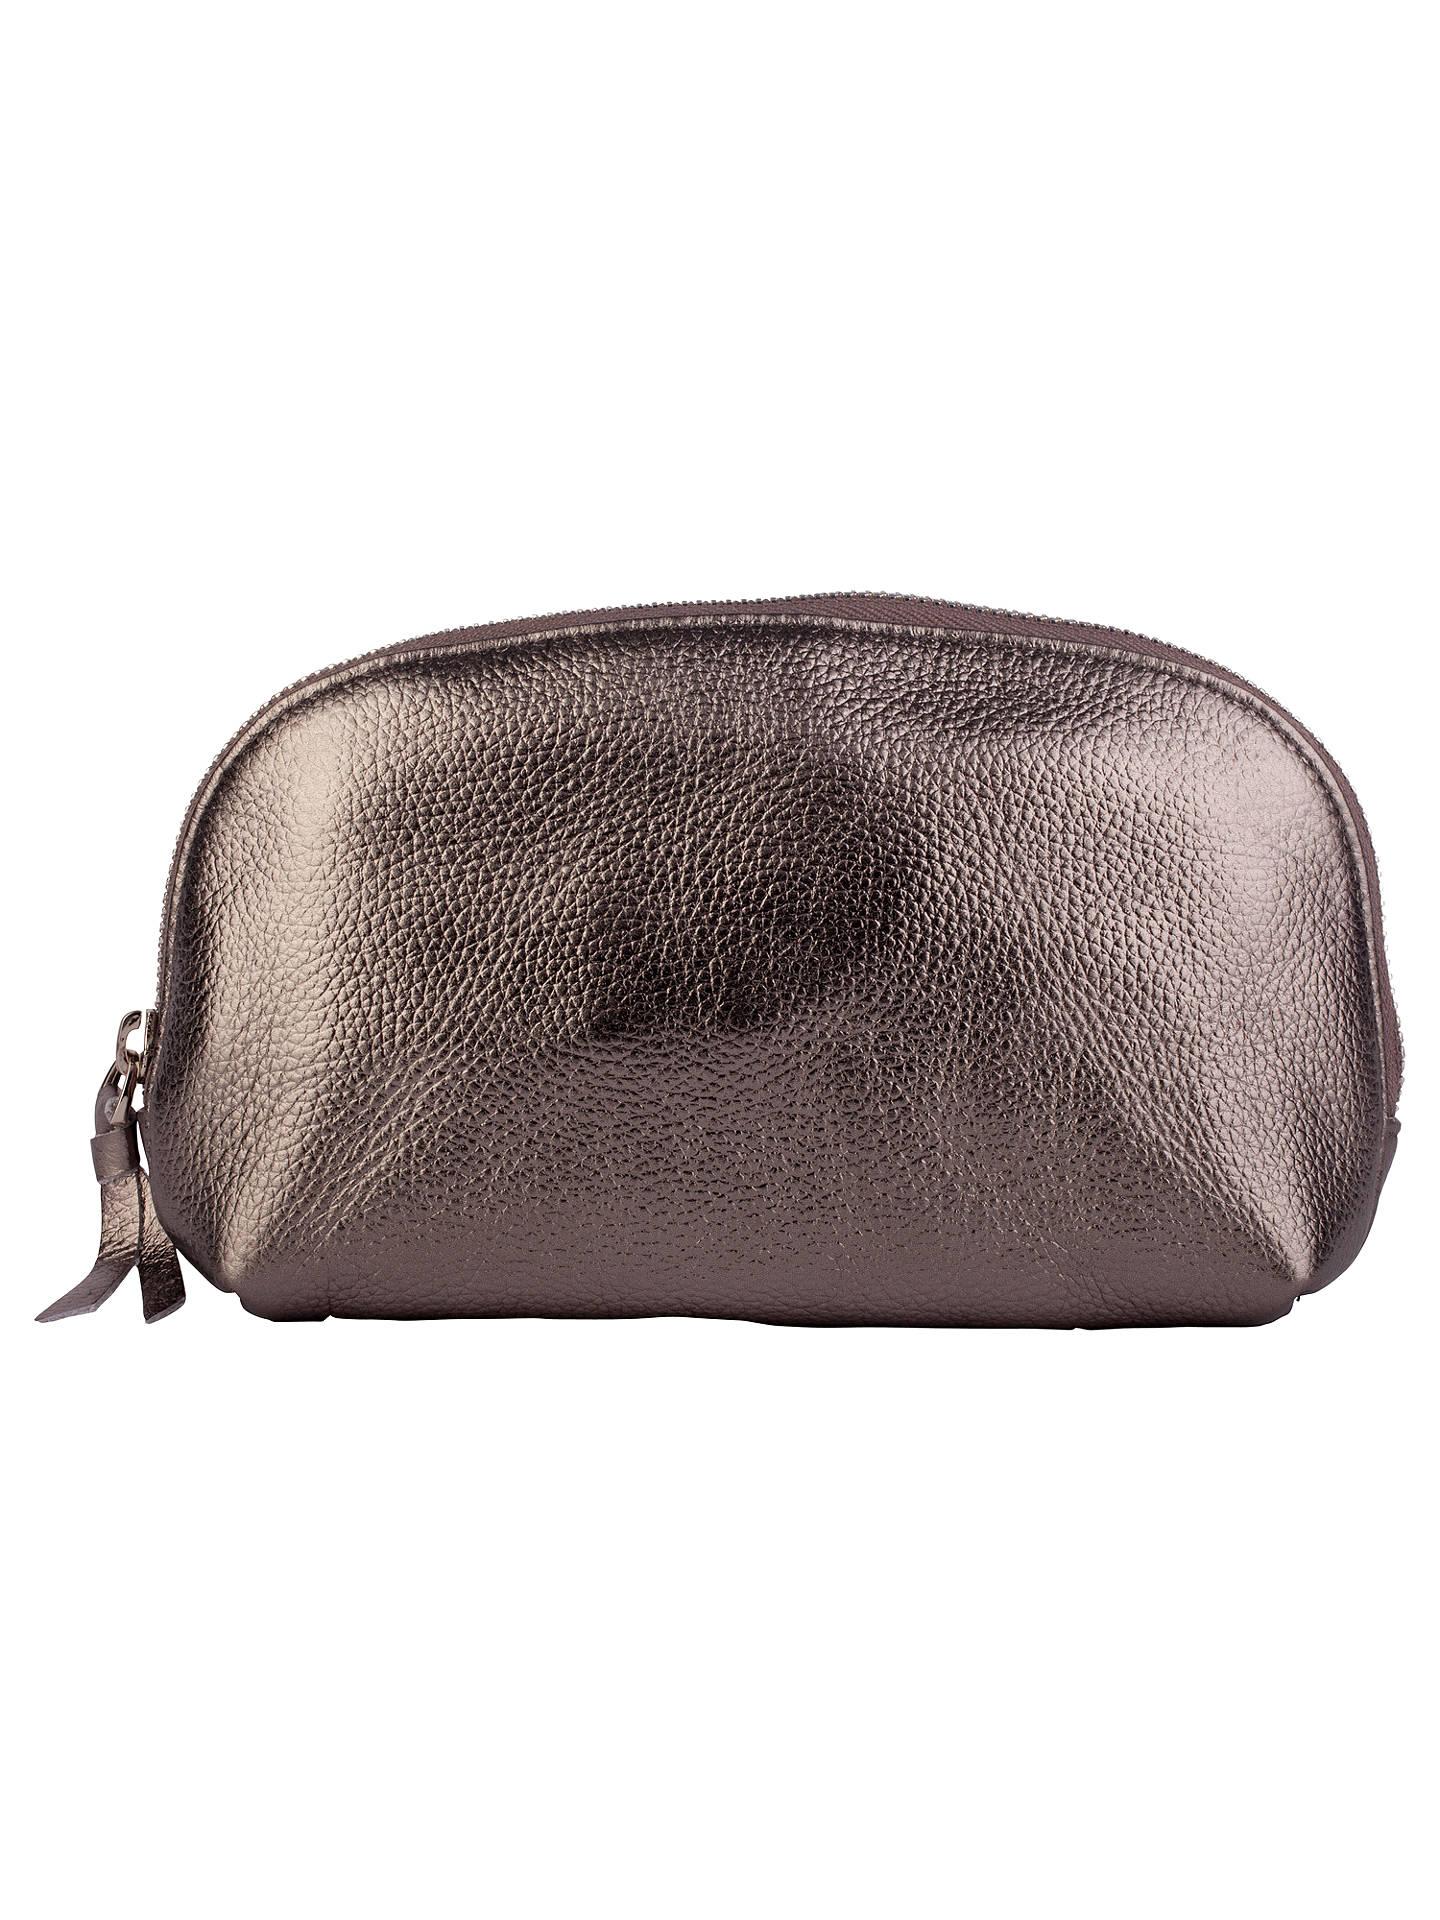 BuySmith   Canova Leather Makeup Bag 830e6cd679a6a